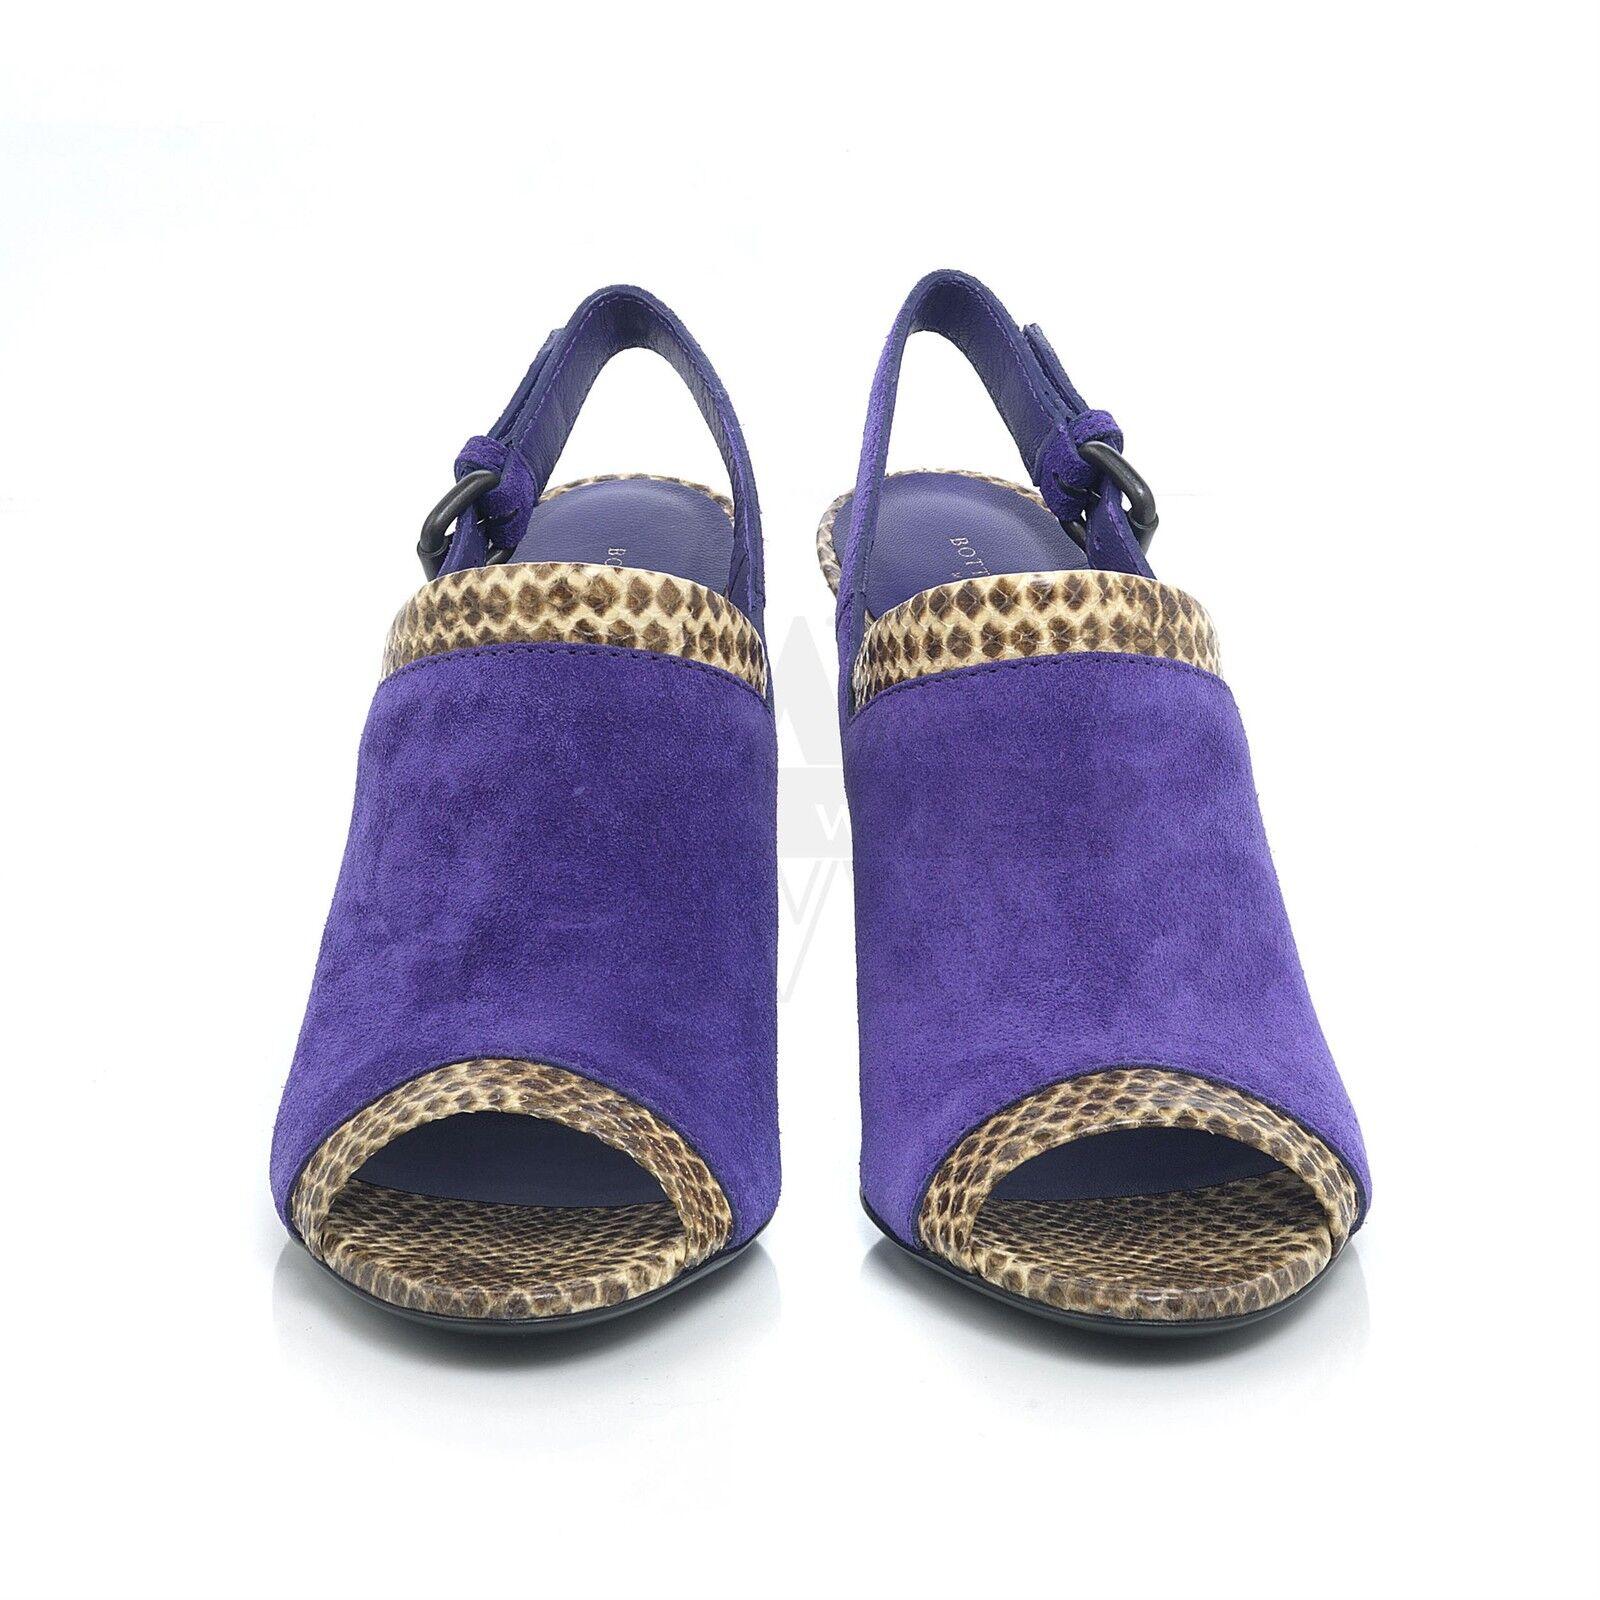 Bottega Veneta 290284 purple Suede & Python Slingback Sandal 7.5 37.5 NIB  950